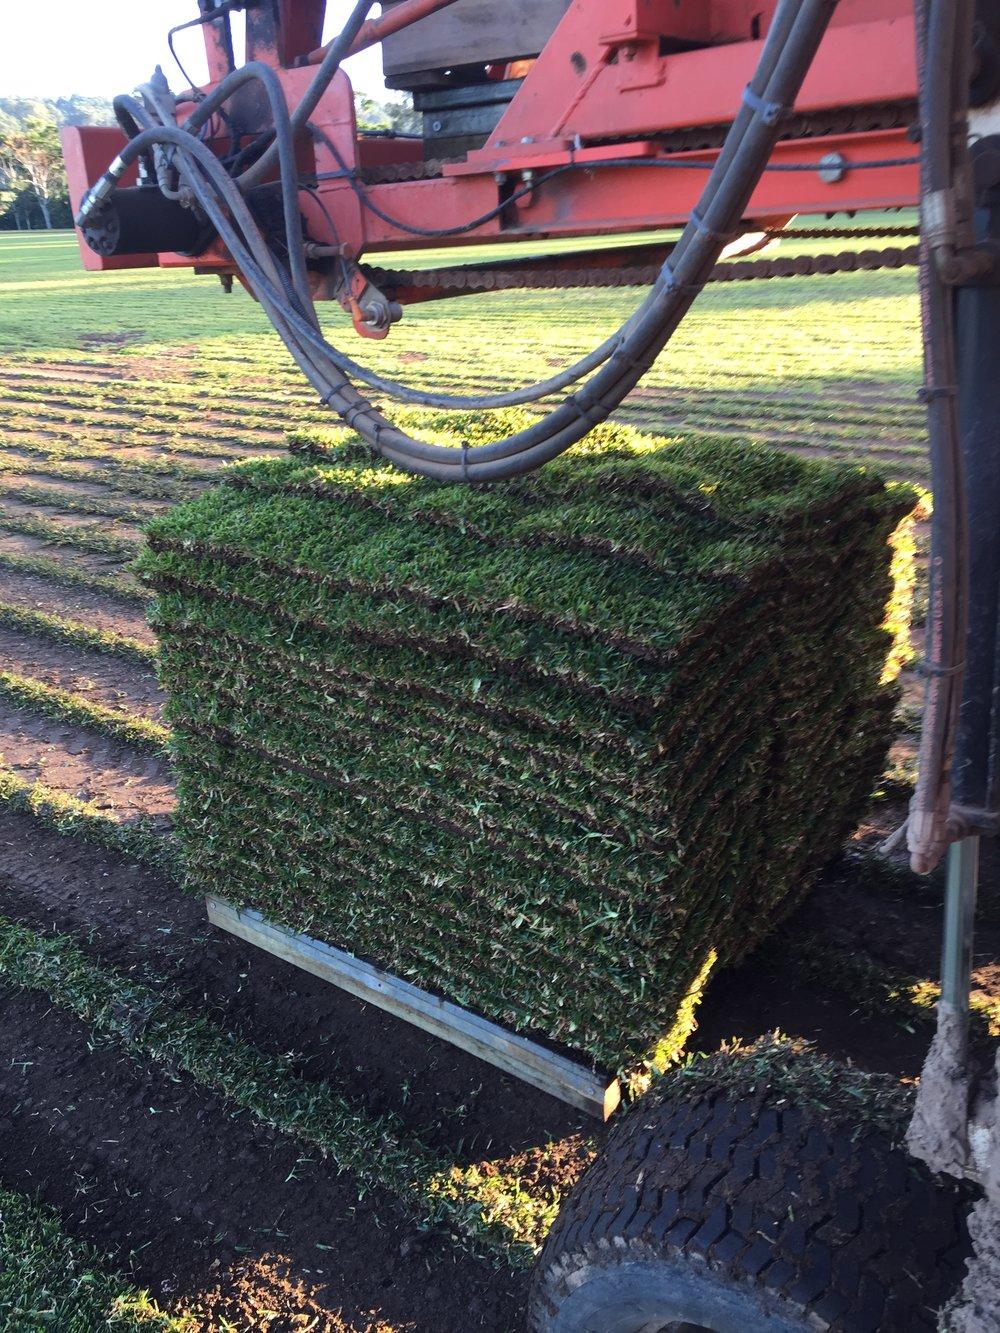 bigstock-Pile-Of-Grass-Rolls-4437941.jpg